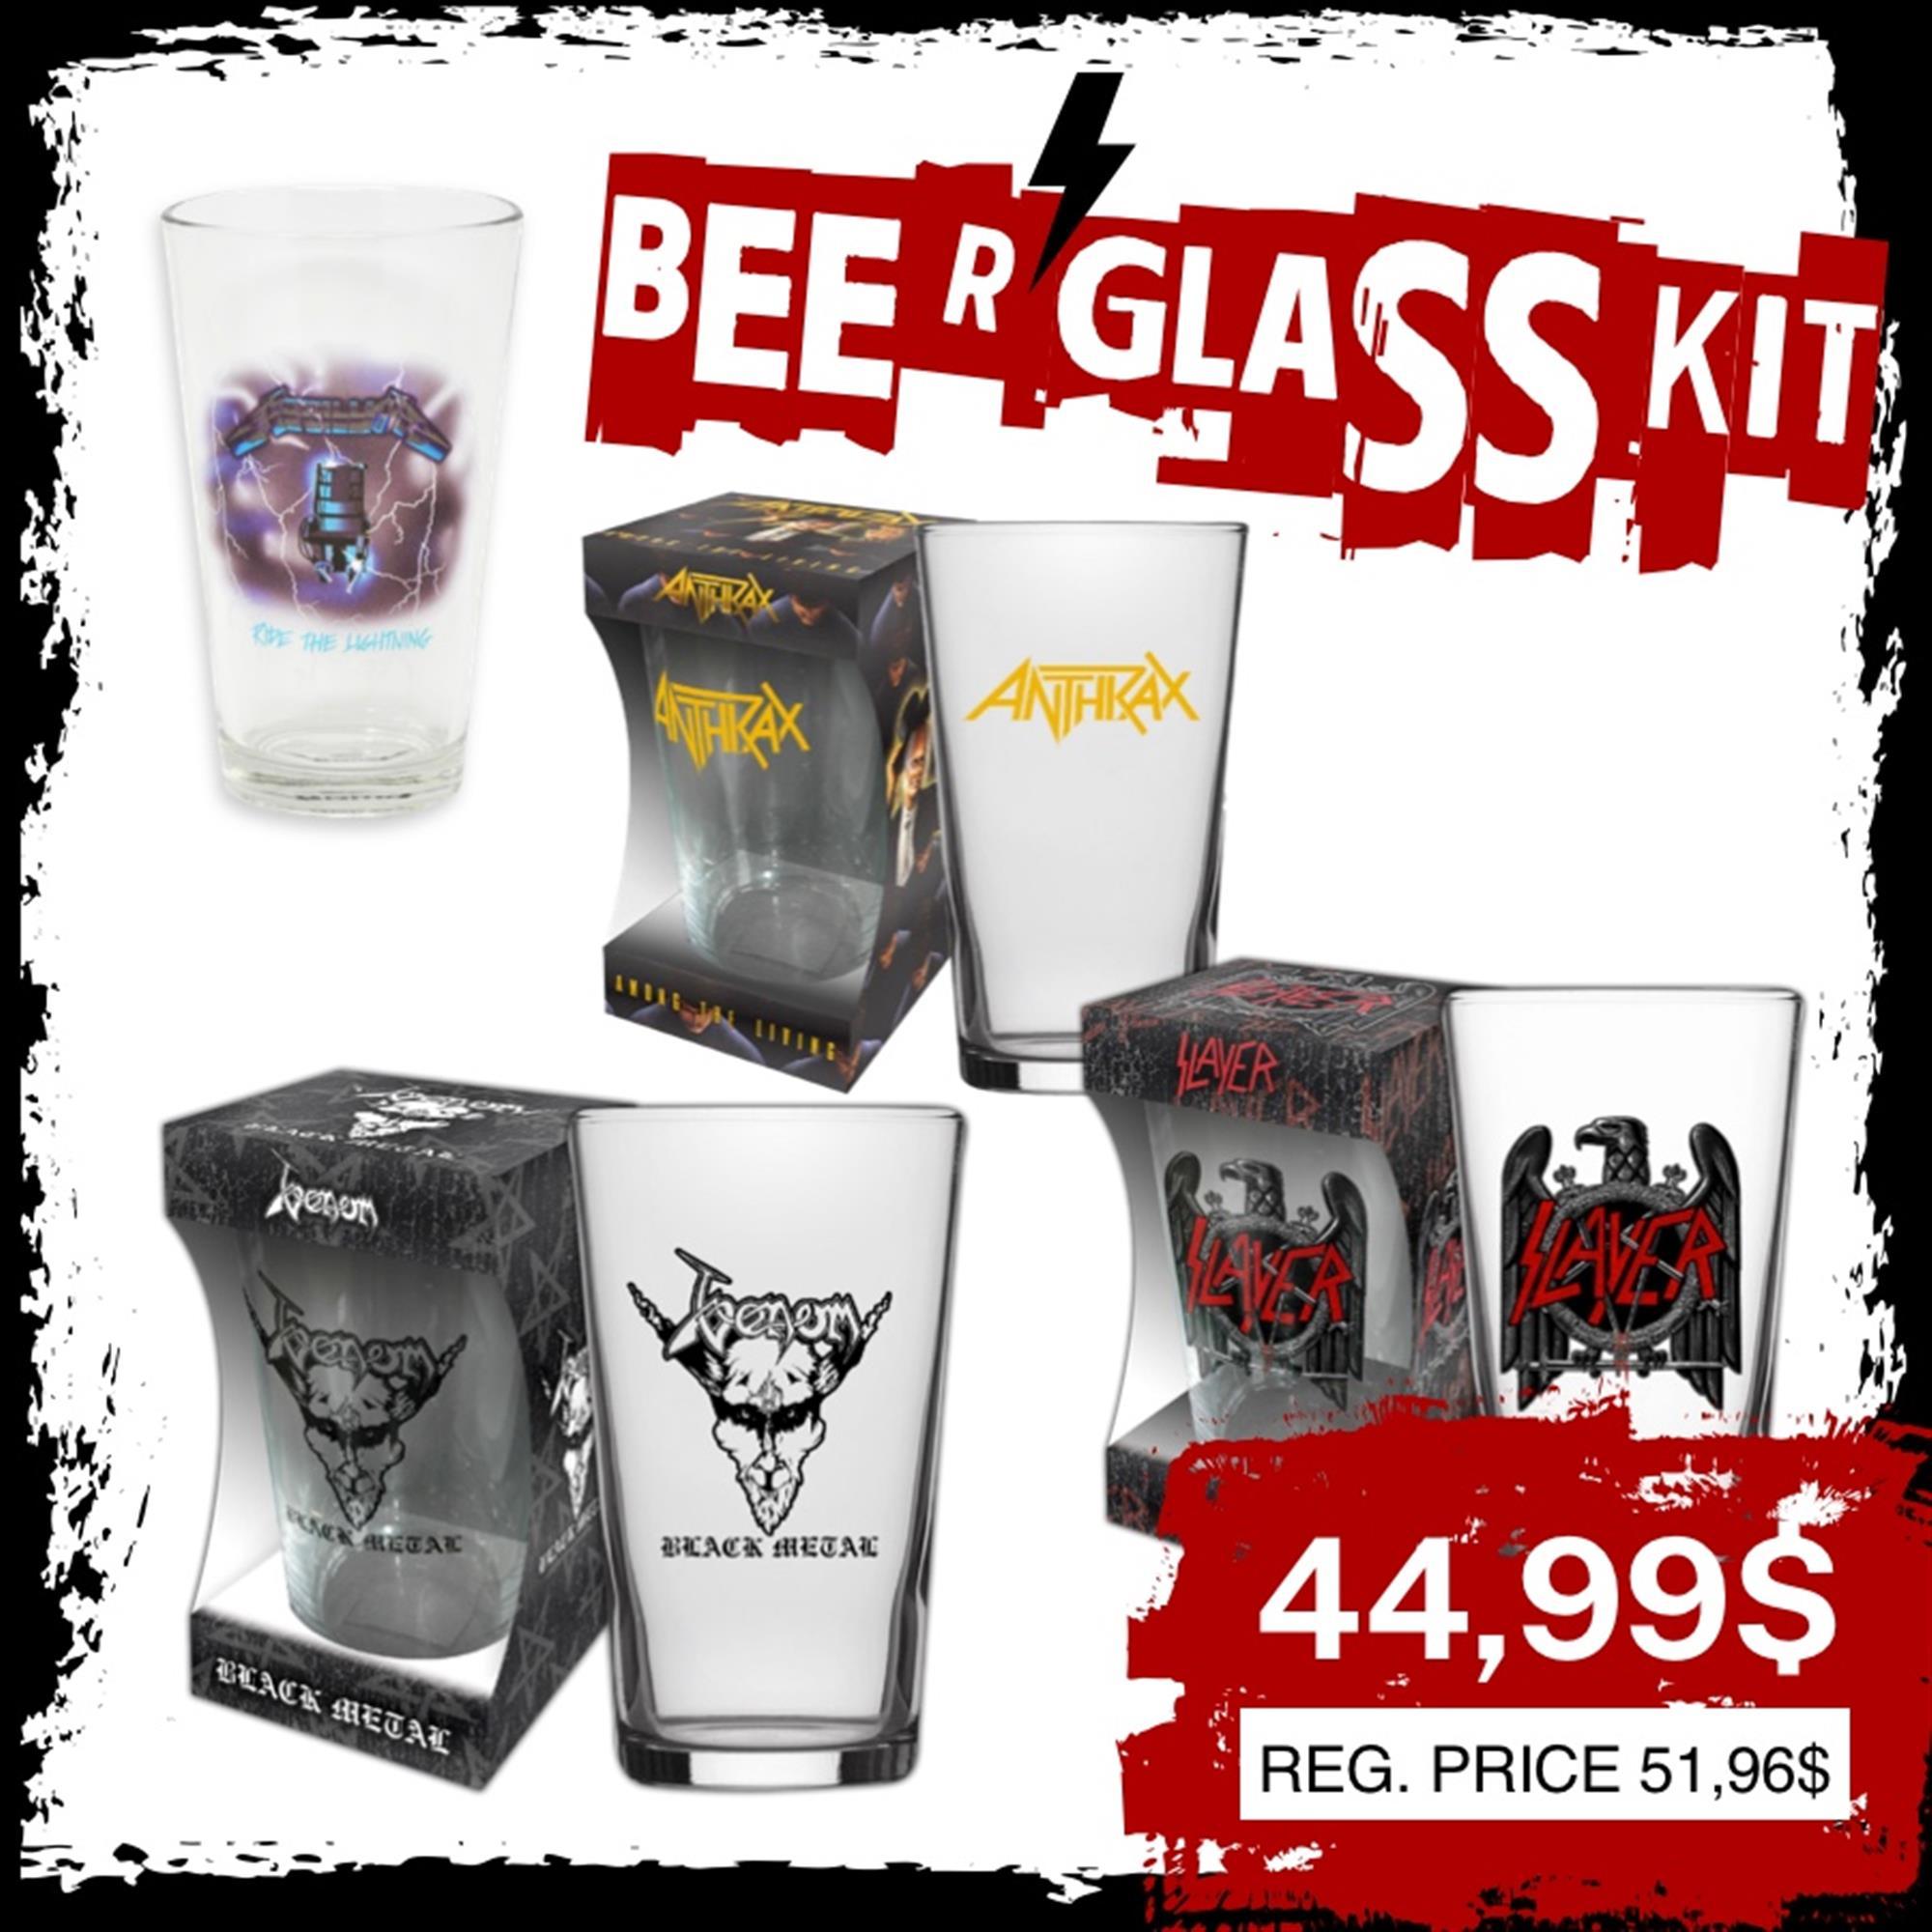 BEER GLASS KIT 2